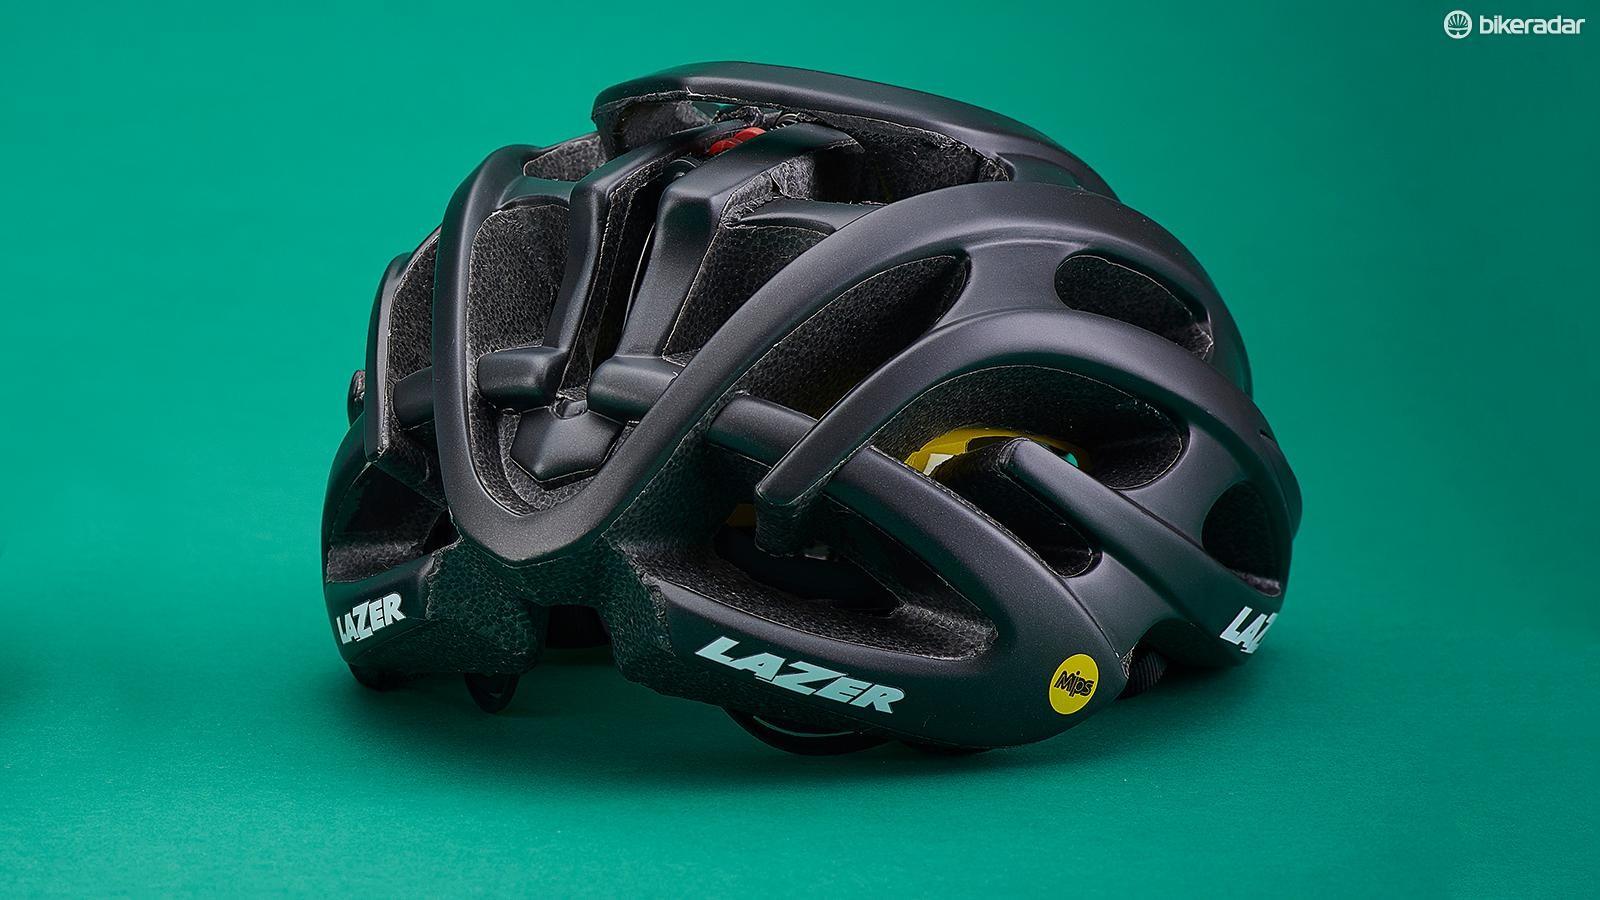 The Lazer Blade MIPS helmet